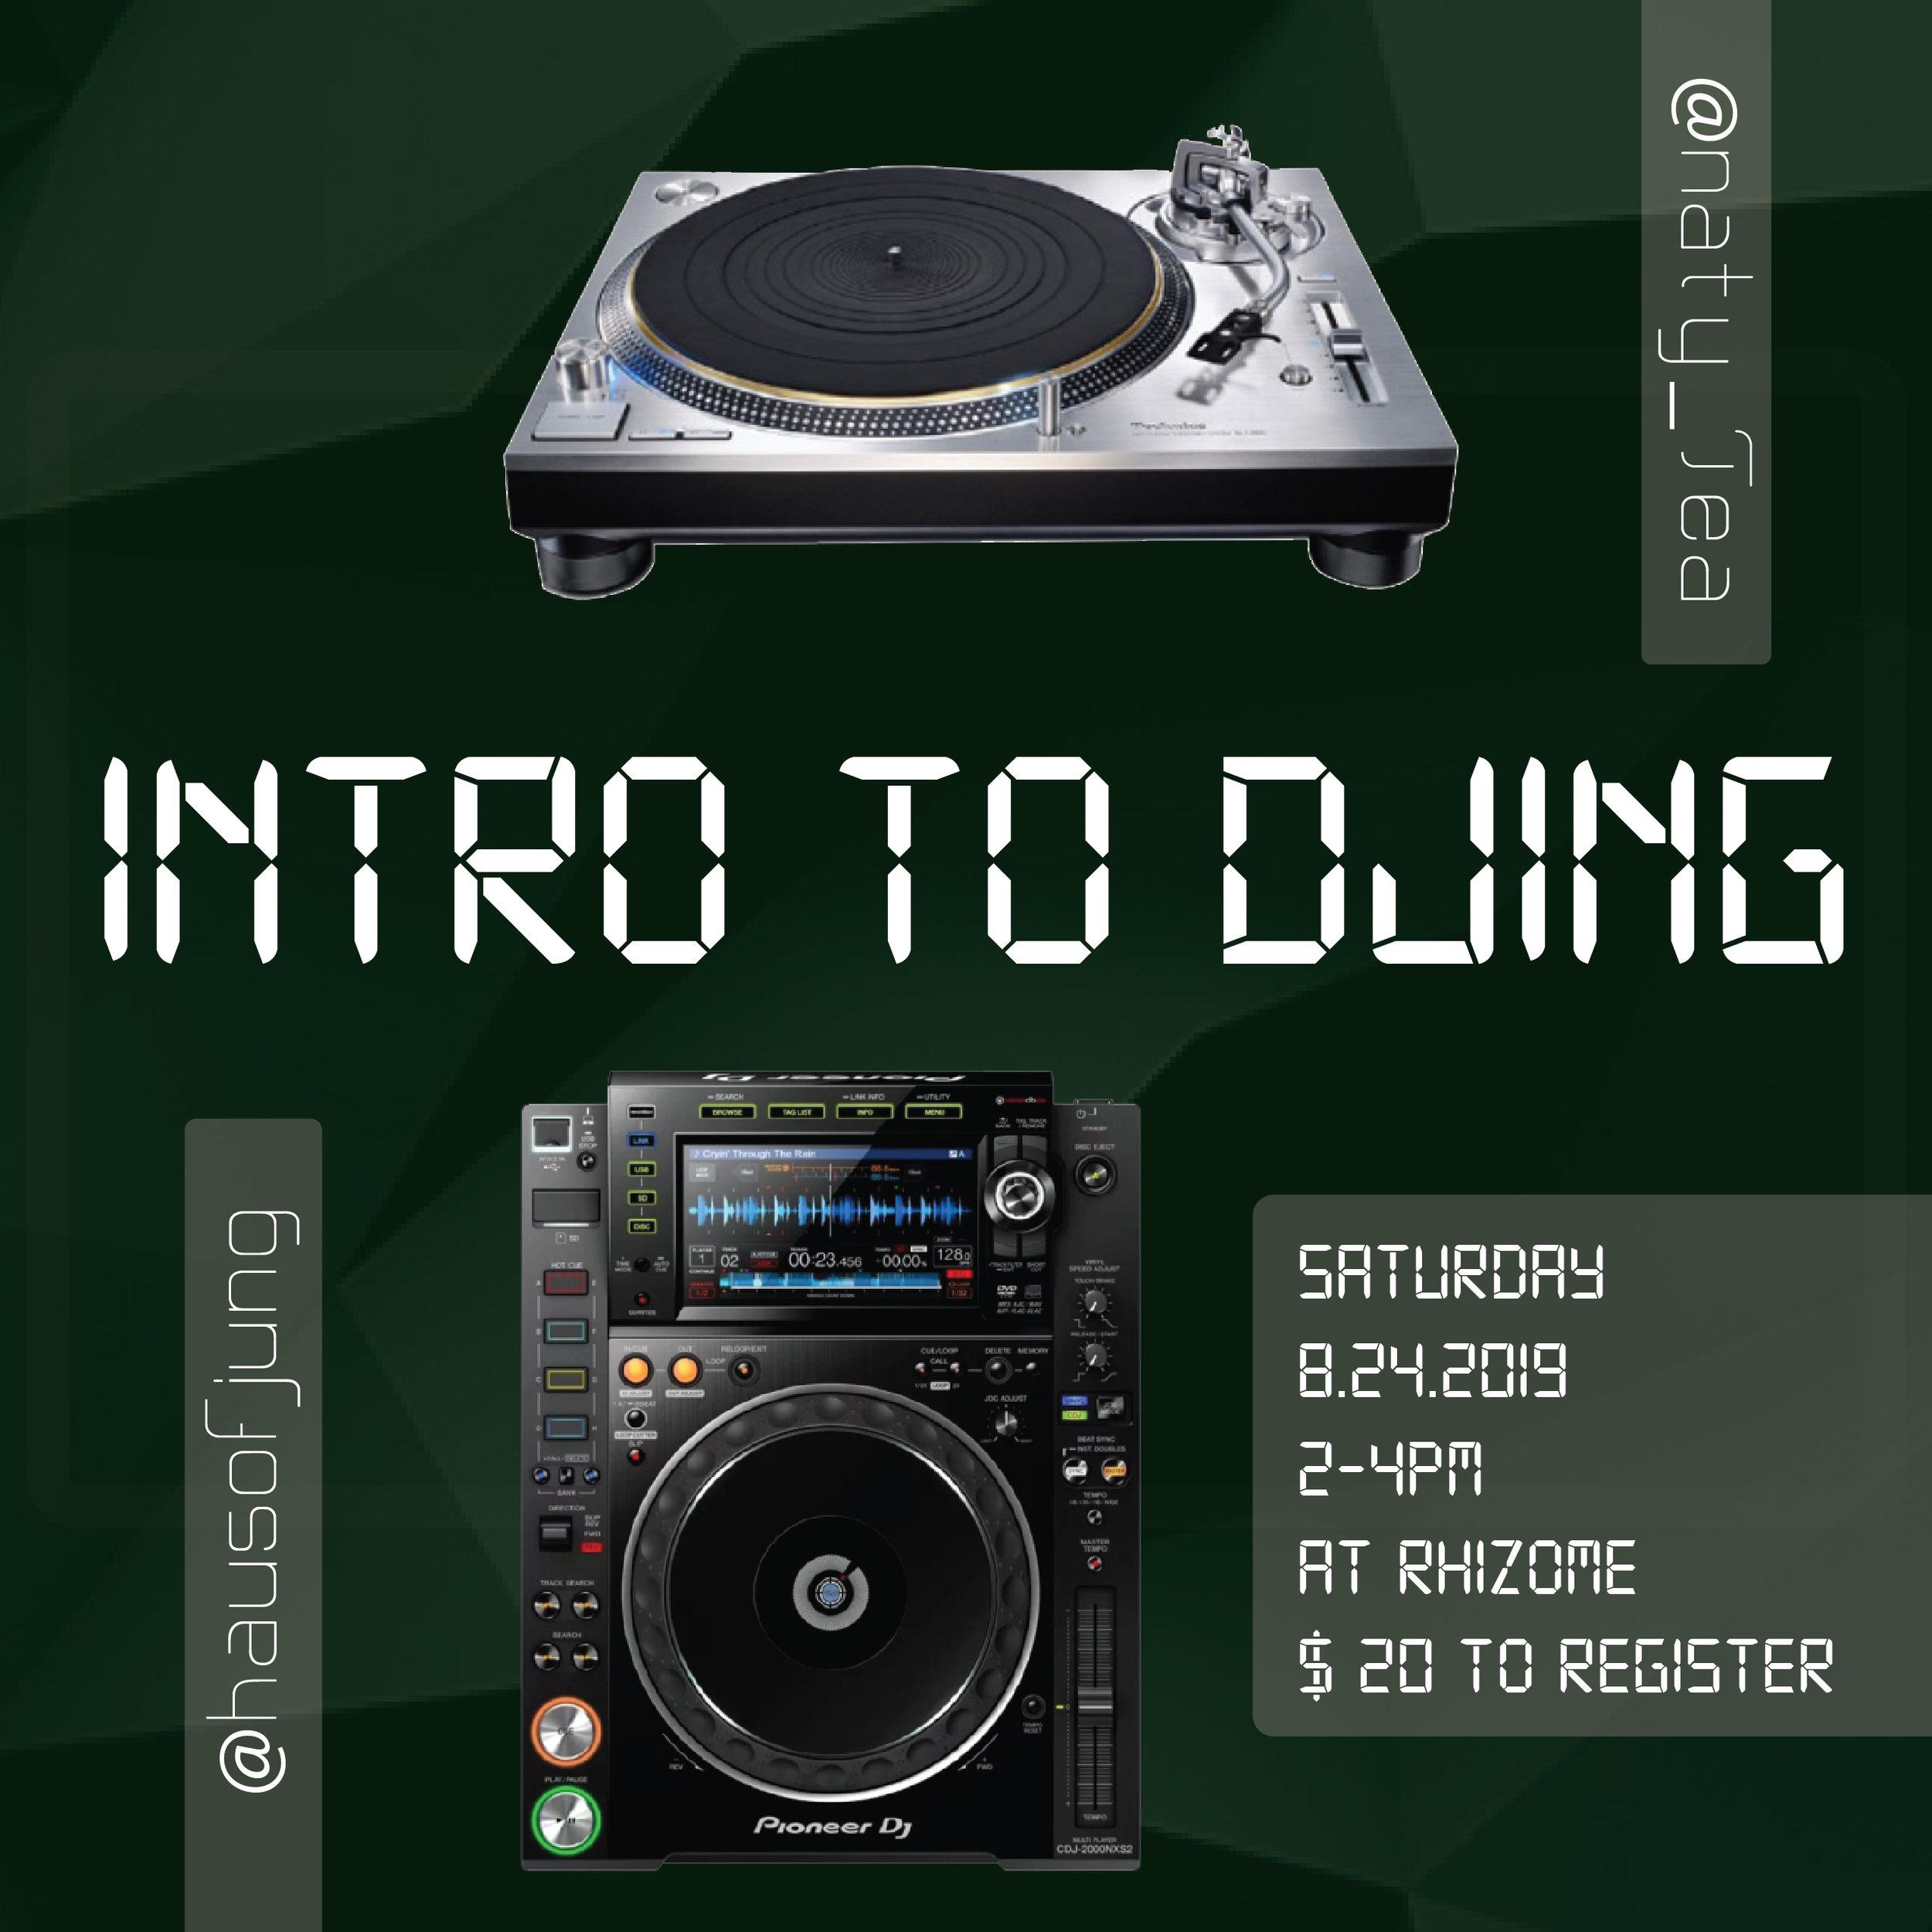 DJing 3-01.jpg